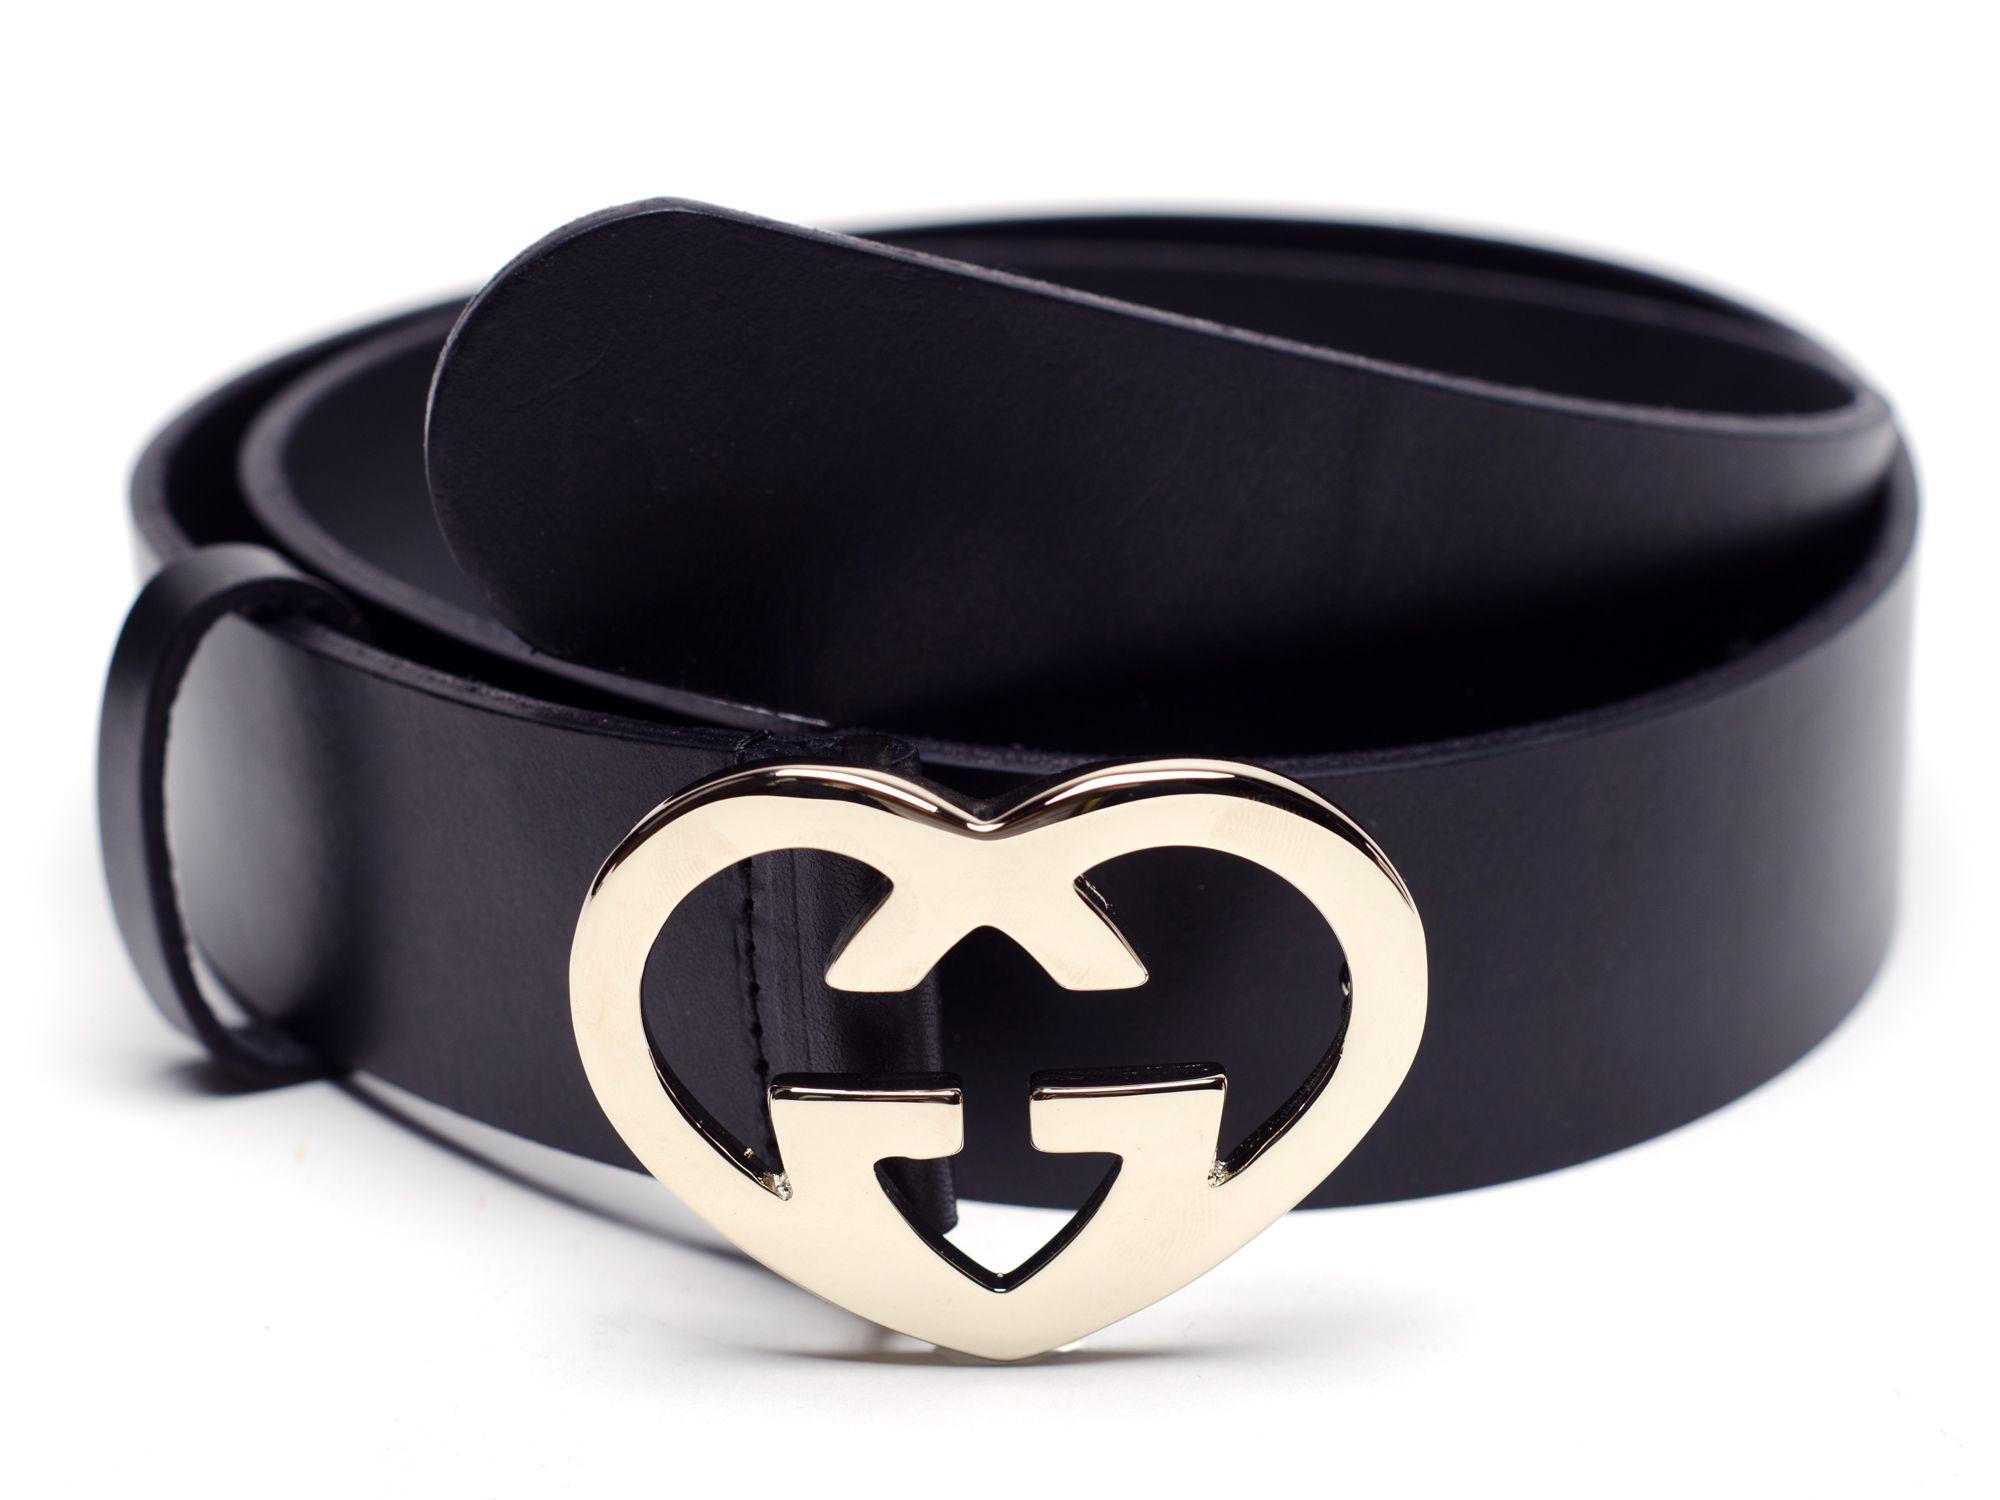 de539543a LivingSocial Shop: Gucci Belt with Heart Buckle | amazing | Belt ...